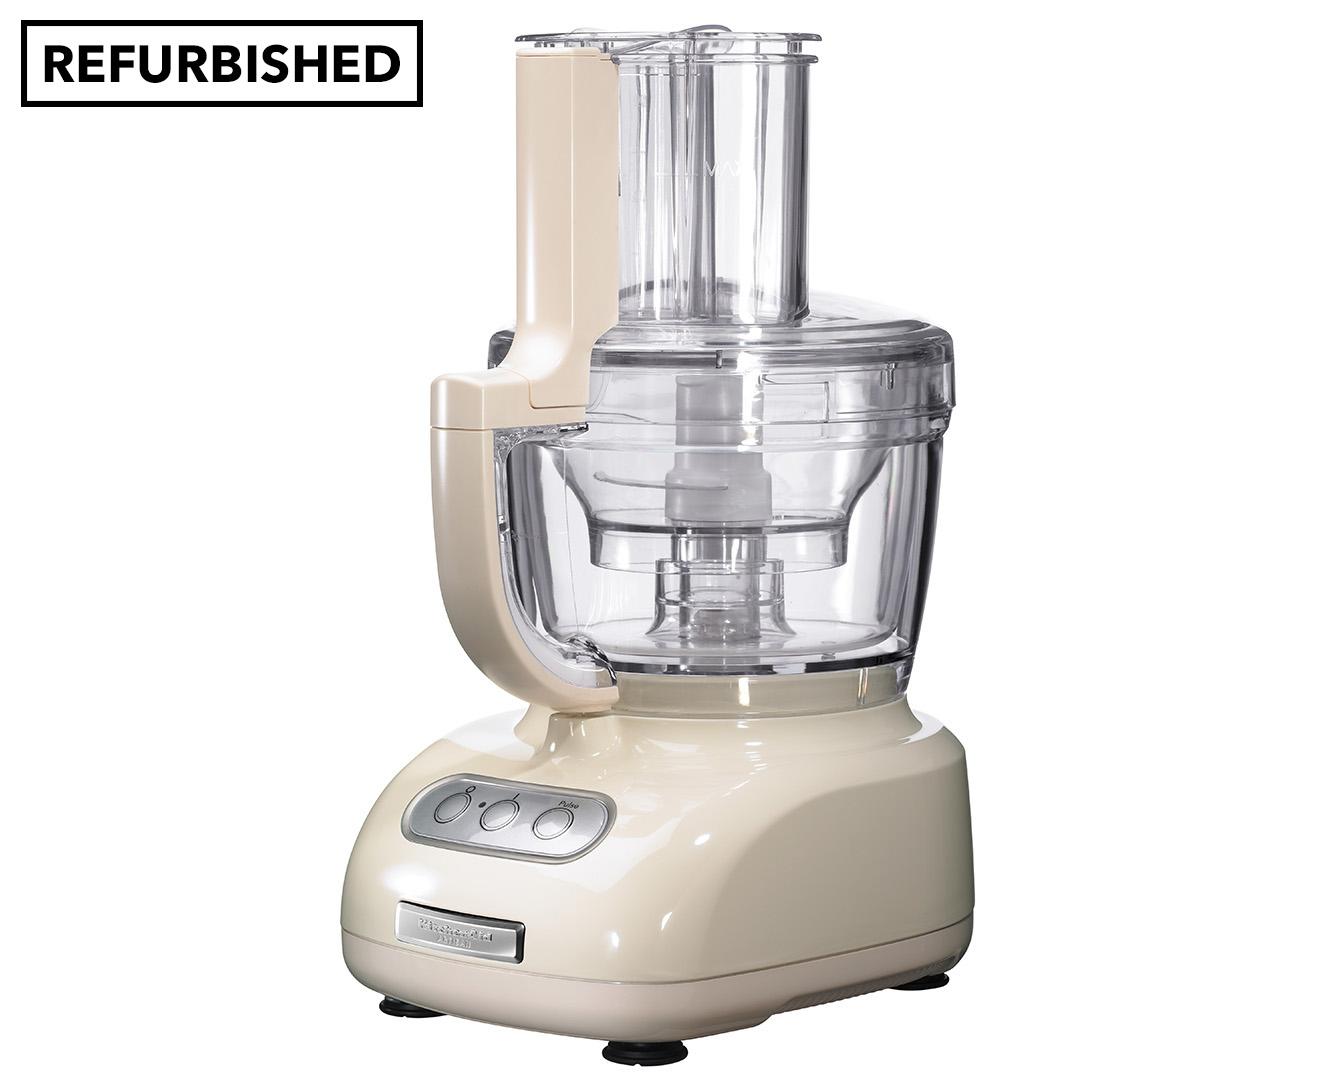 Kitchen Aid Compact Food Processor